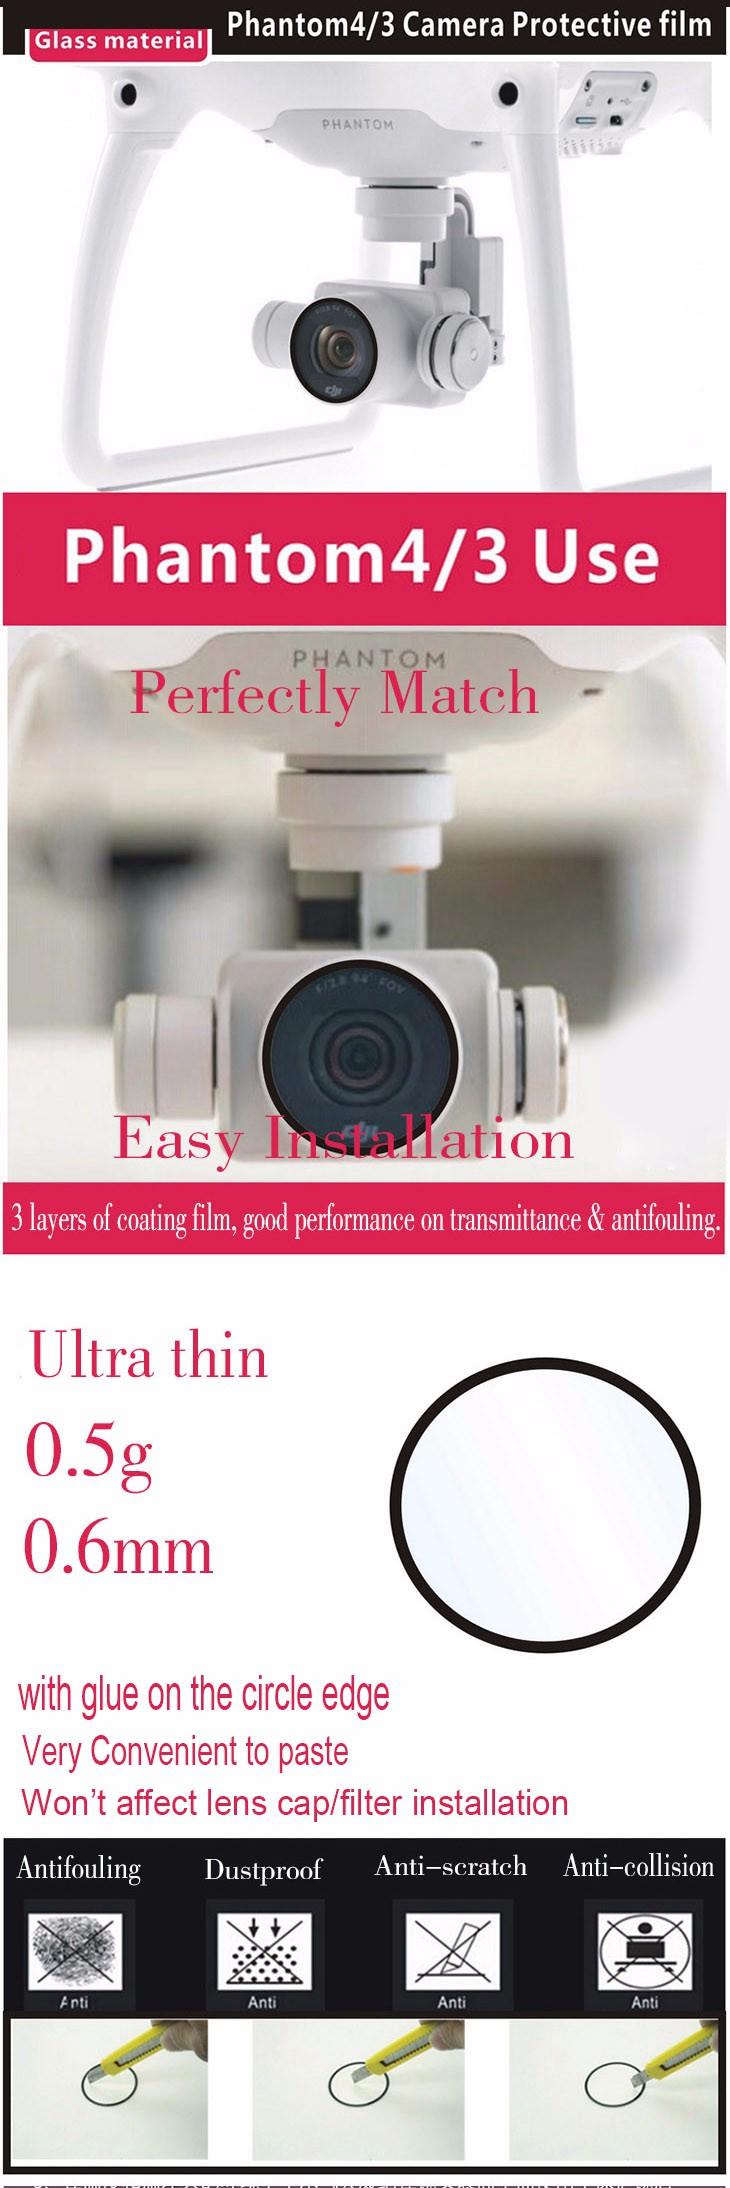 DJI Phantom 3/4 Accessories Camera Glass Film Ultra Thin Protective Film Dustproof Anti-scratch